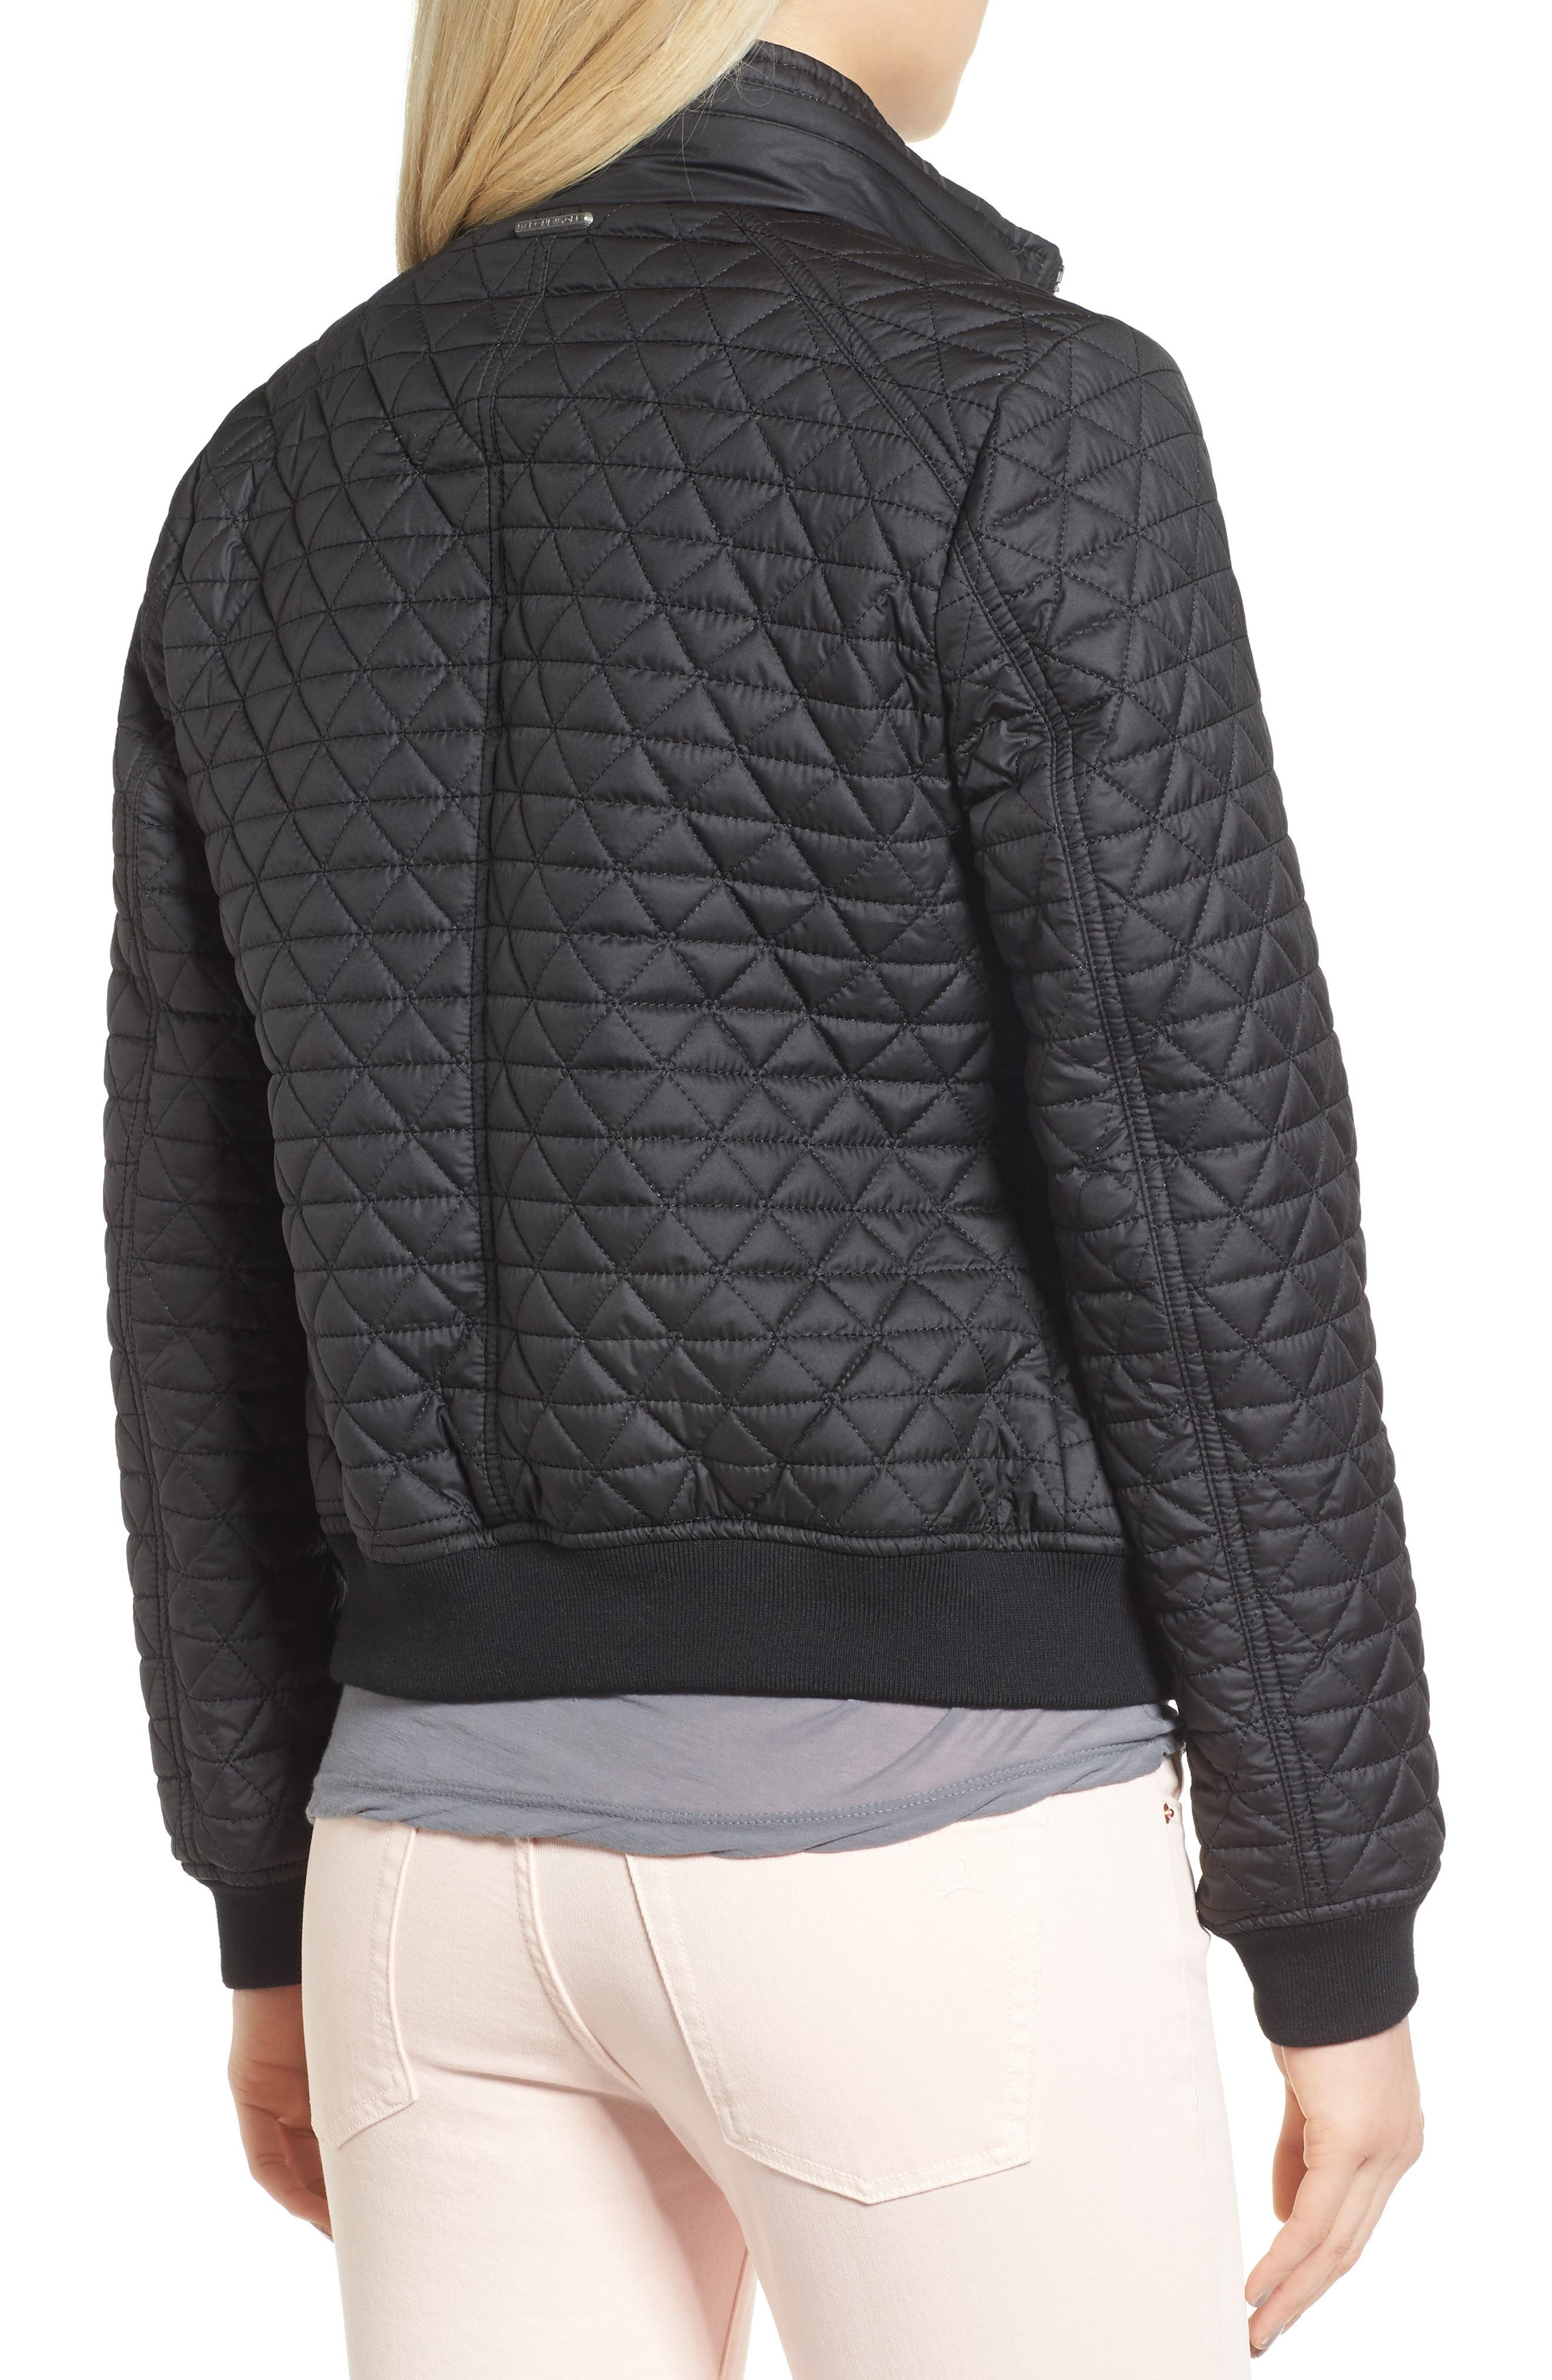 Leather jacket repair toronto - Leather Jacket Repair Toronto 49